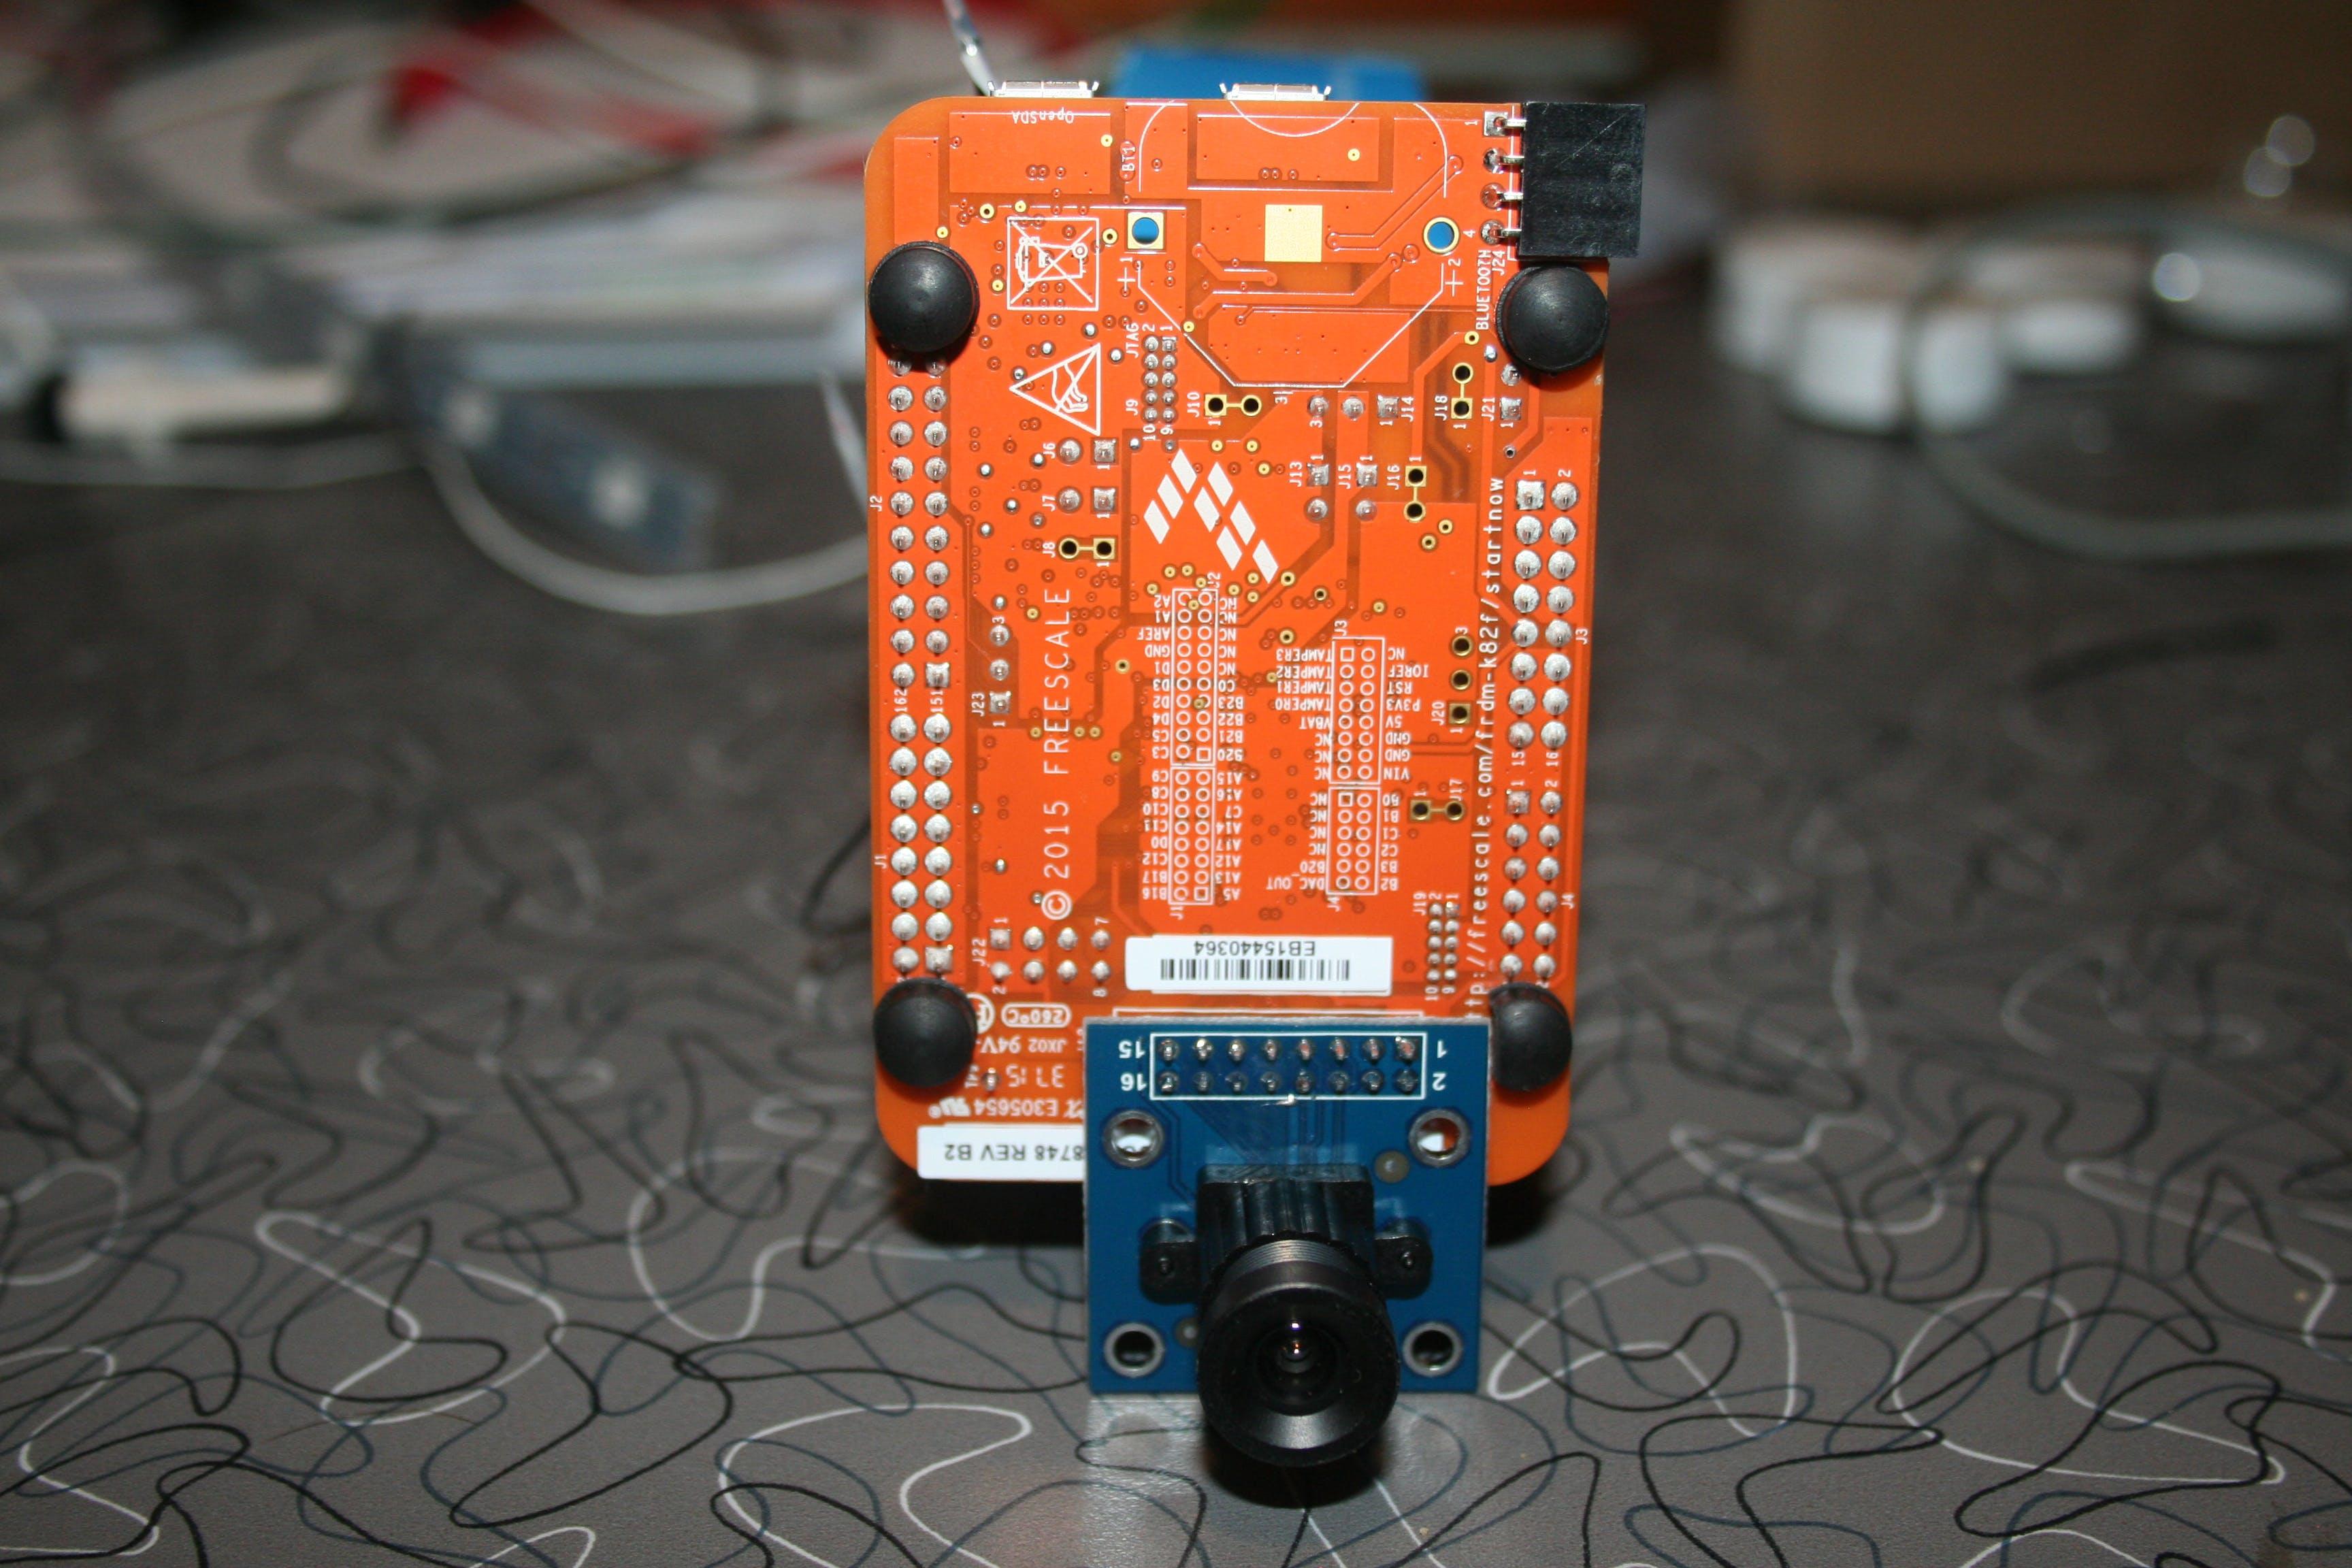 Directional Motion-Detecting USB Web Cam Using a FRDM-K82F